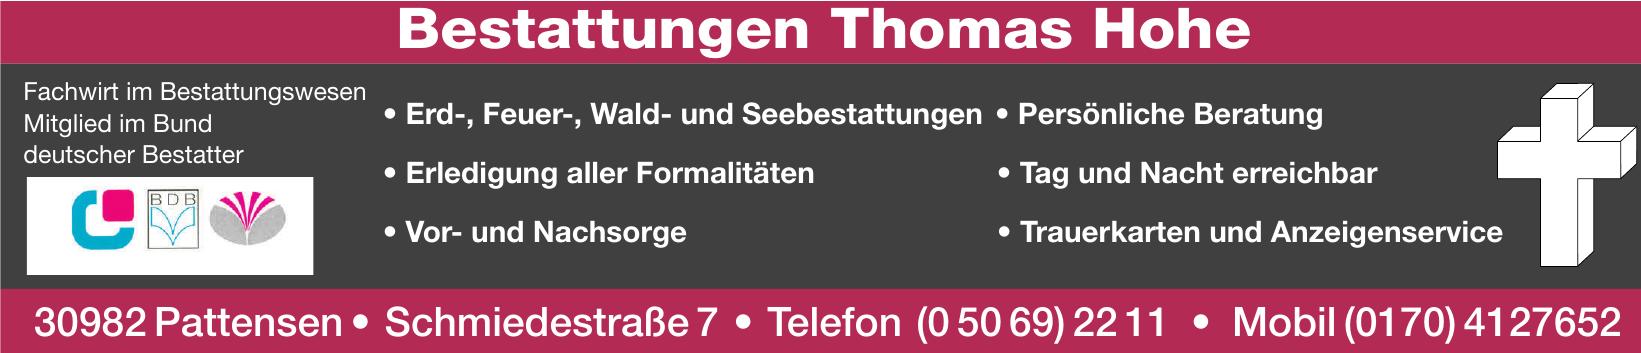 Bestattungen Thomas Hohe